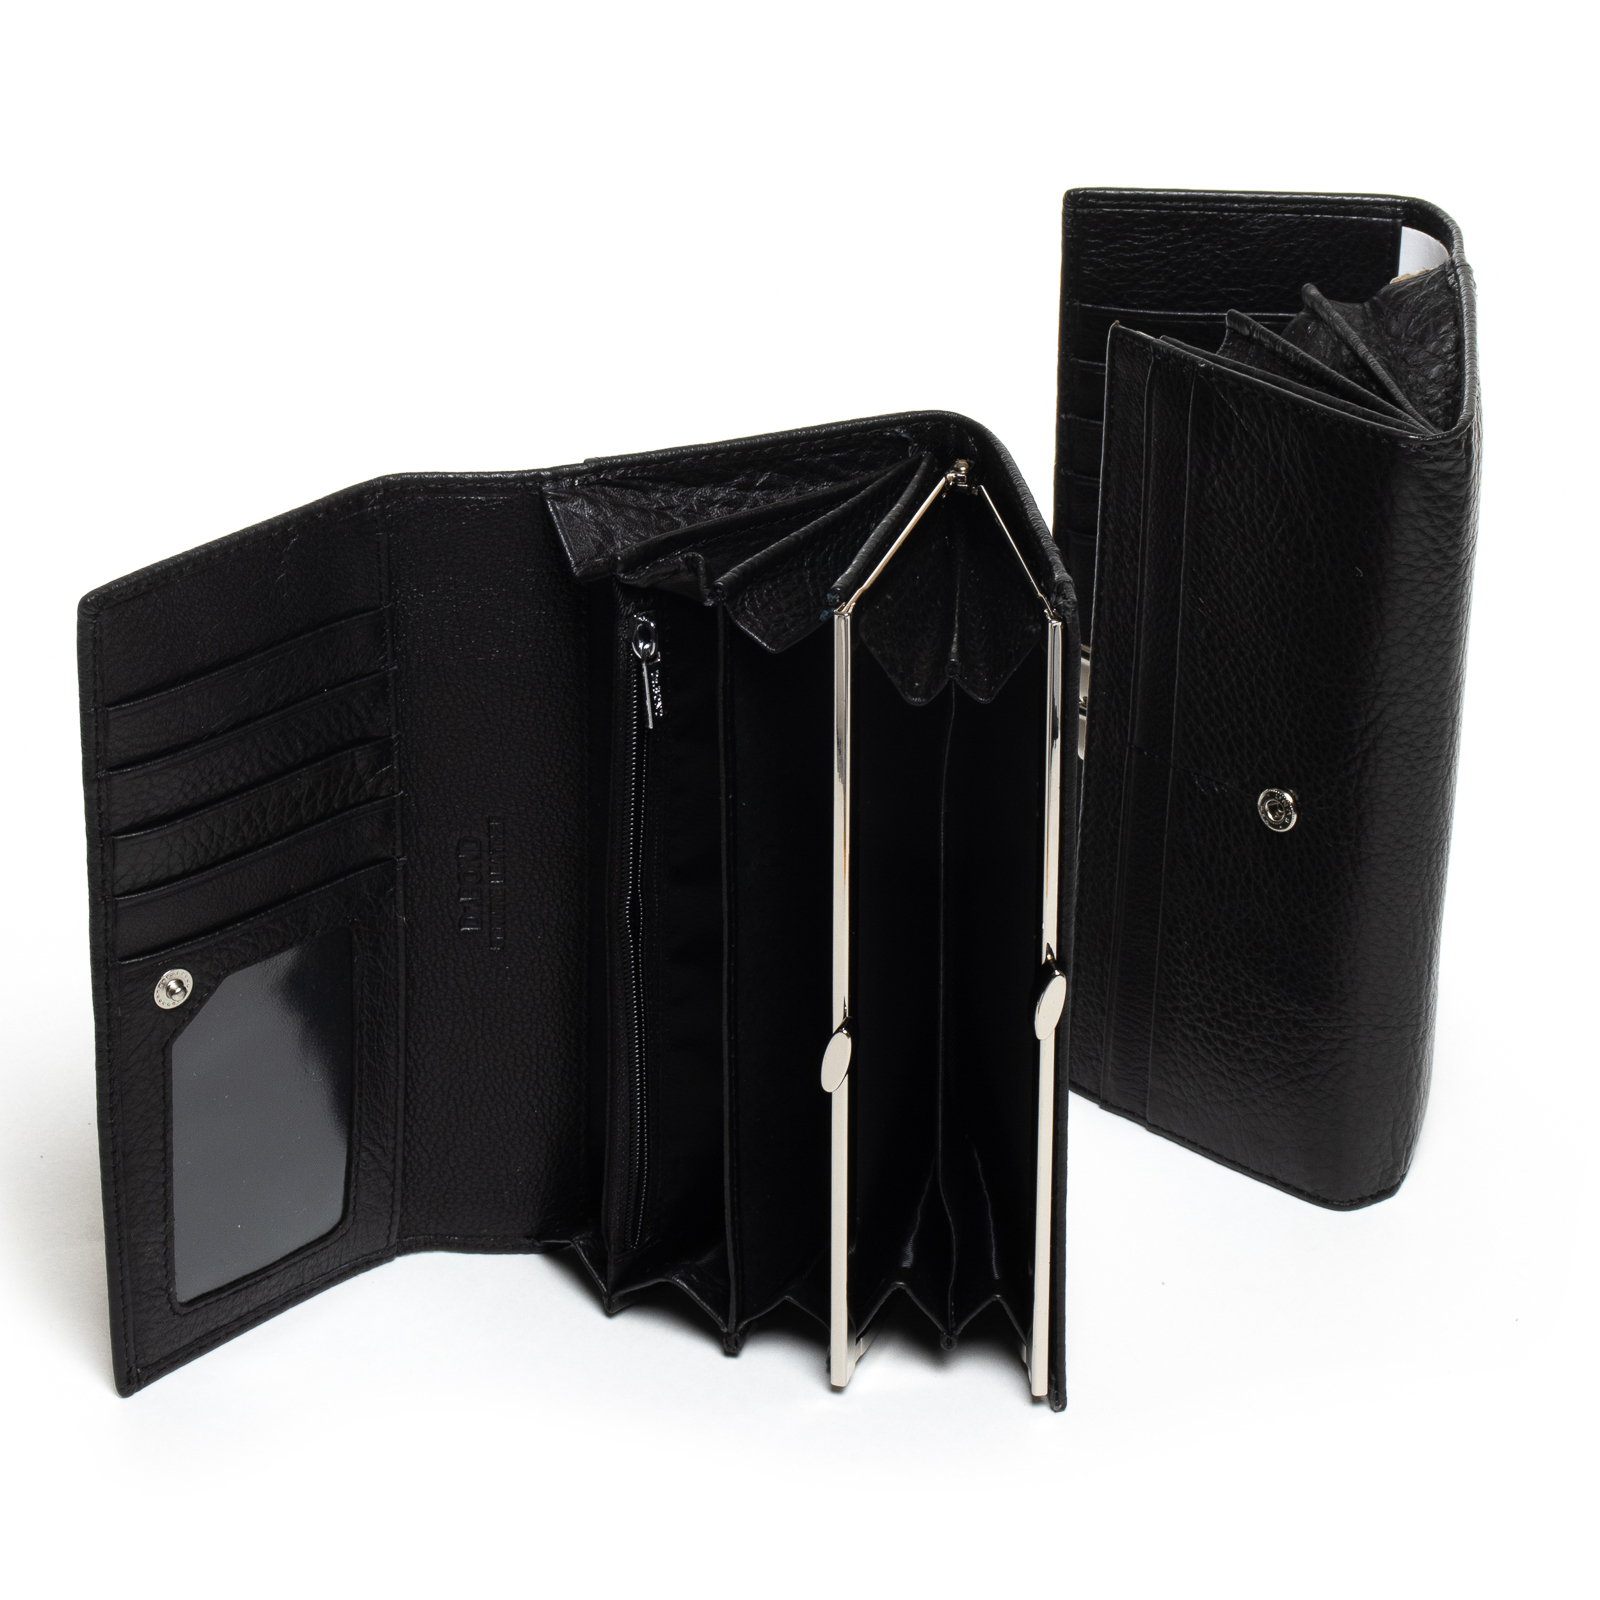 Кошелек Classic кожа DR. BOND W1-V black - фото 4